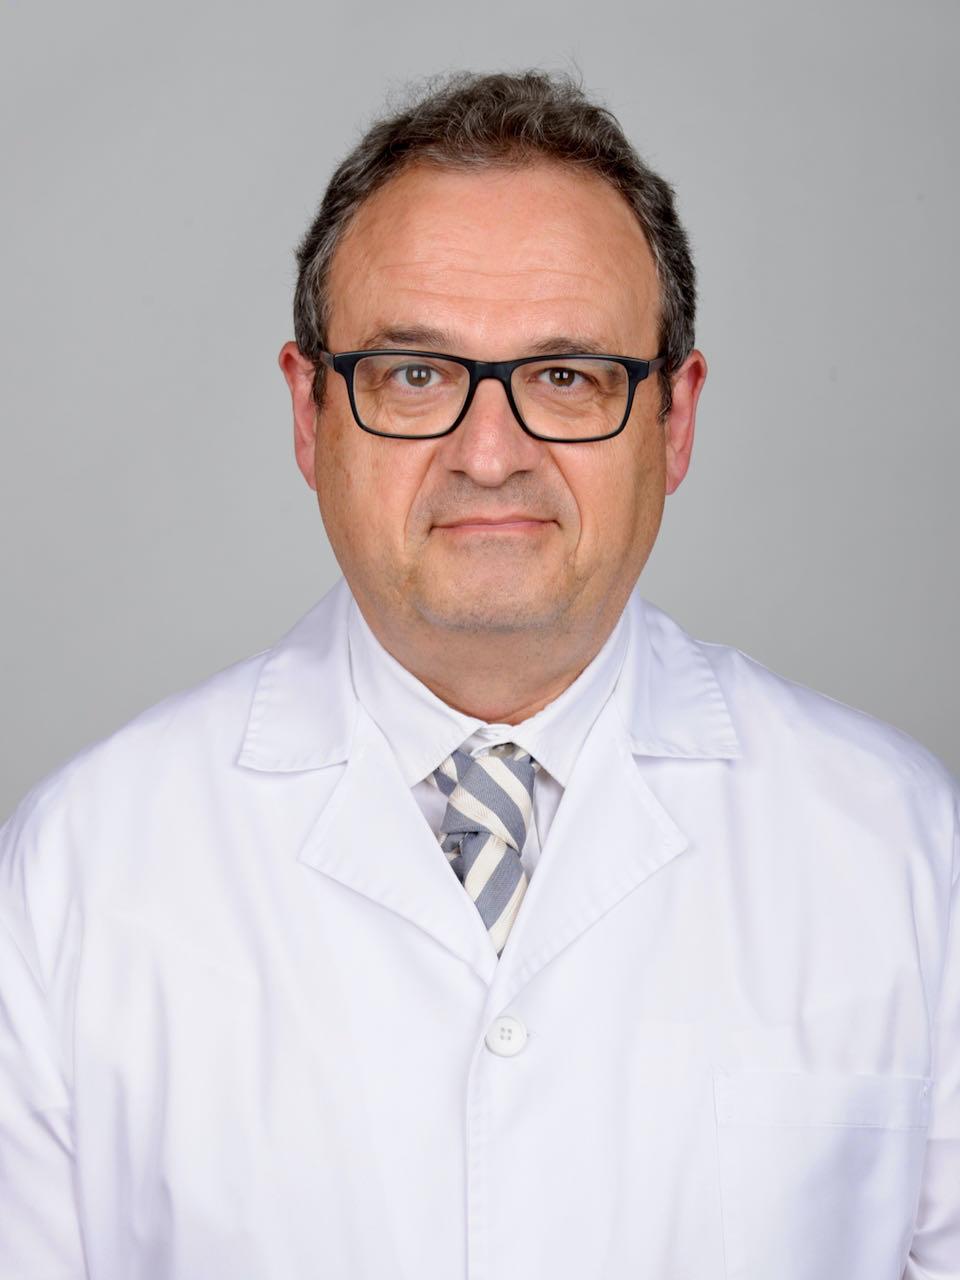 Dr. Joan Josep Berenguer Queraltó